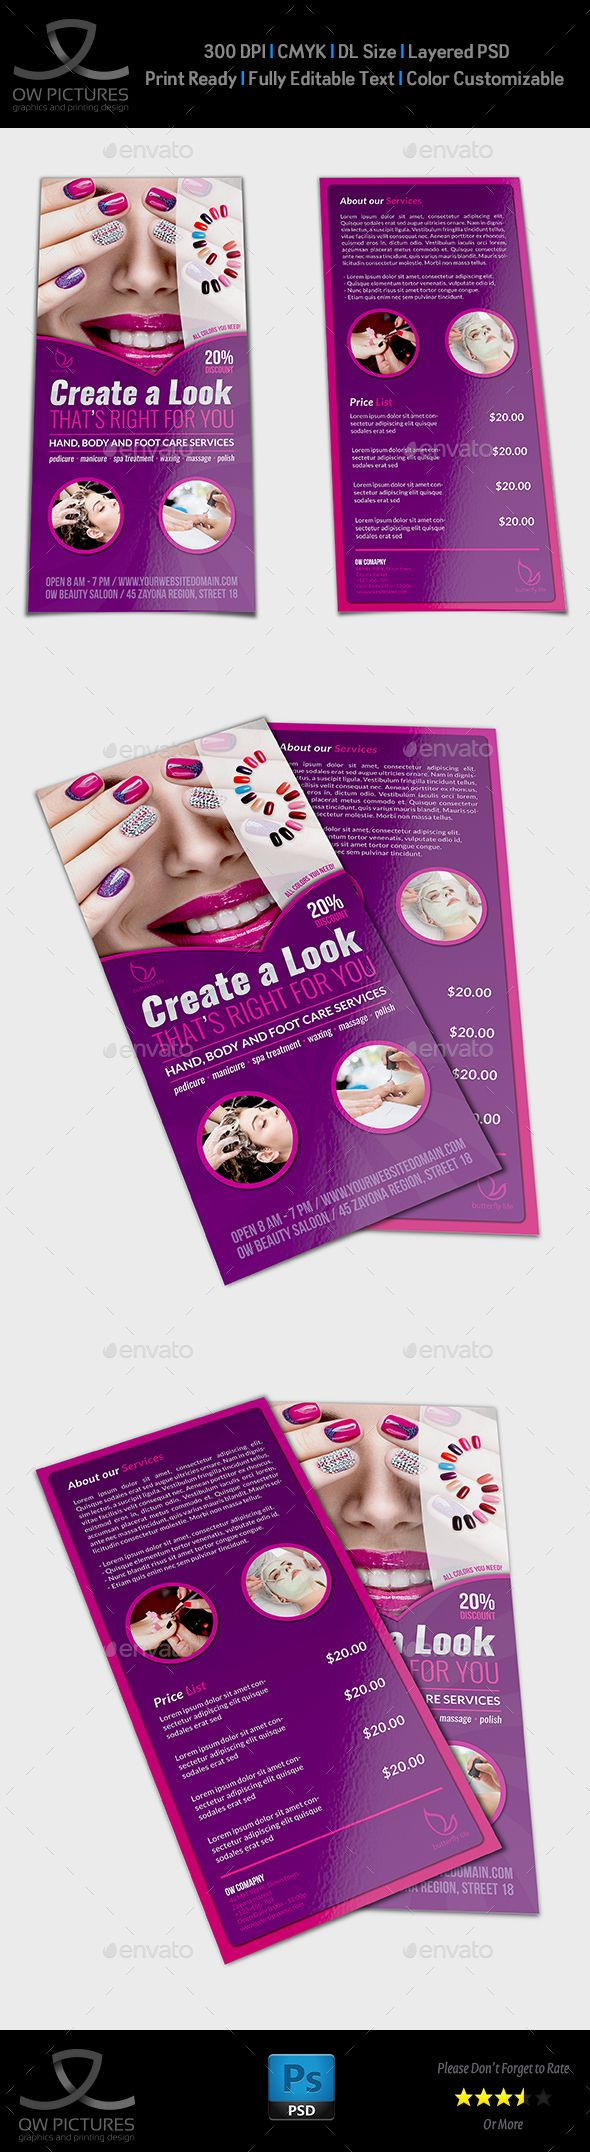 Zumba flyer design zumba flyers - Nail Salon Dl Flyer Template